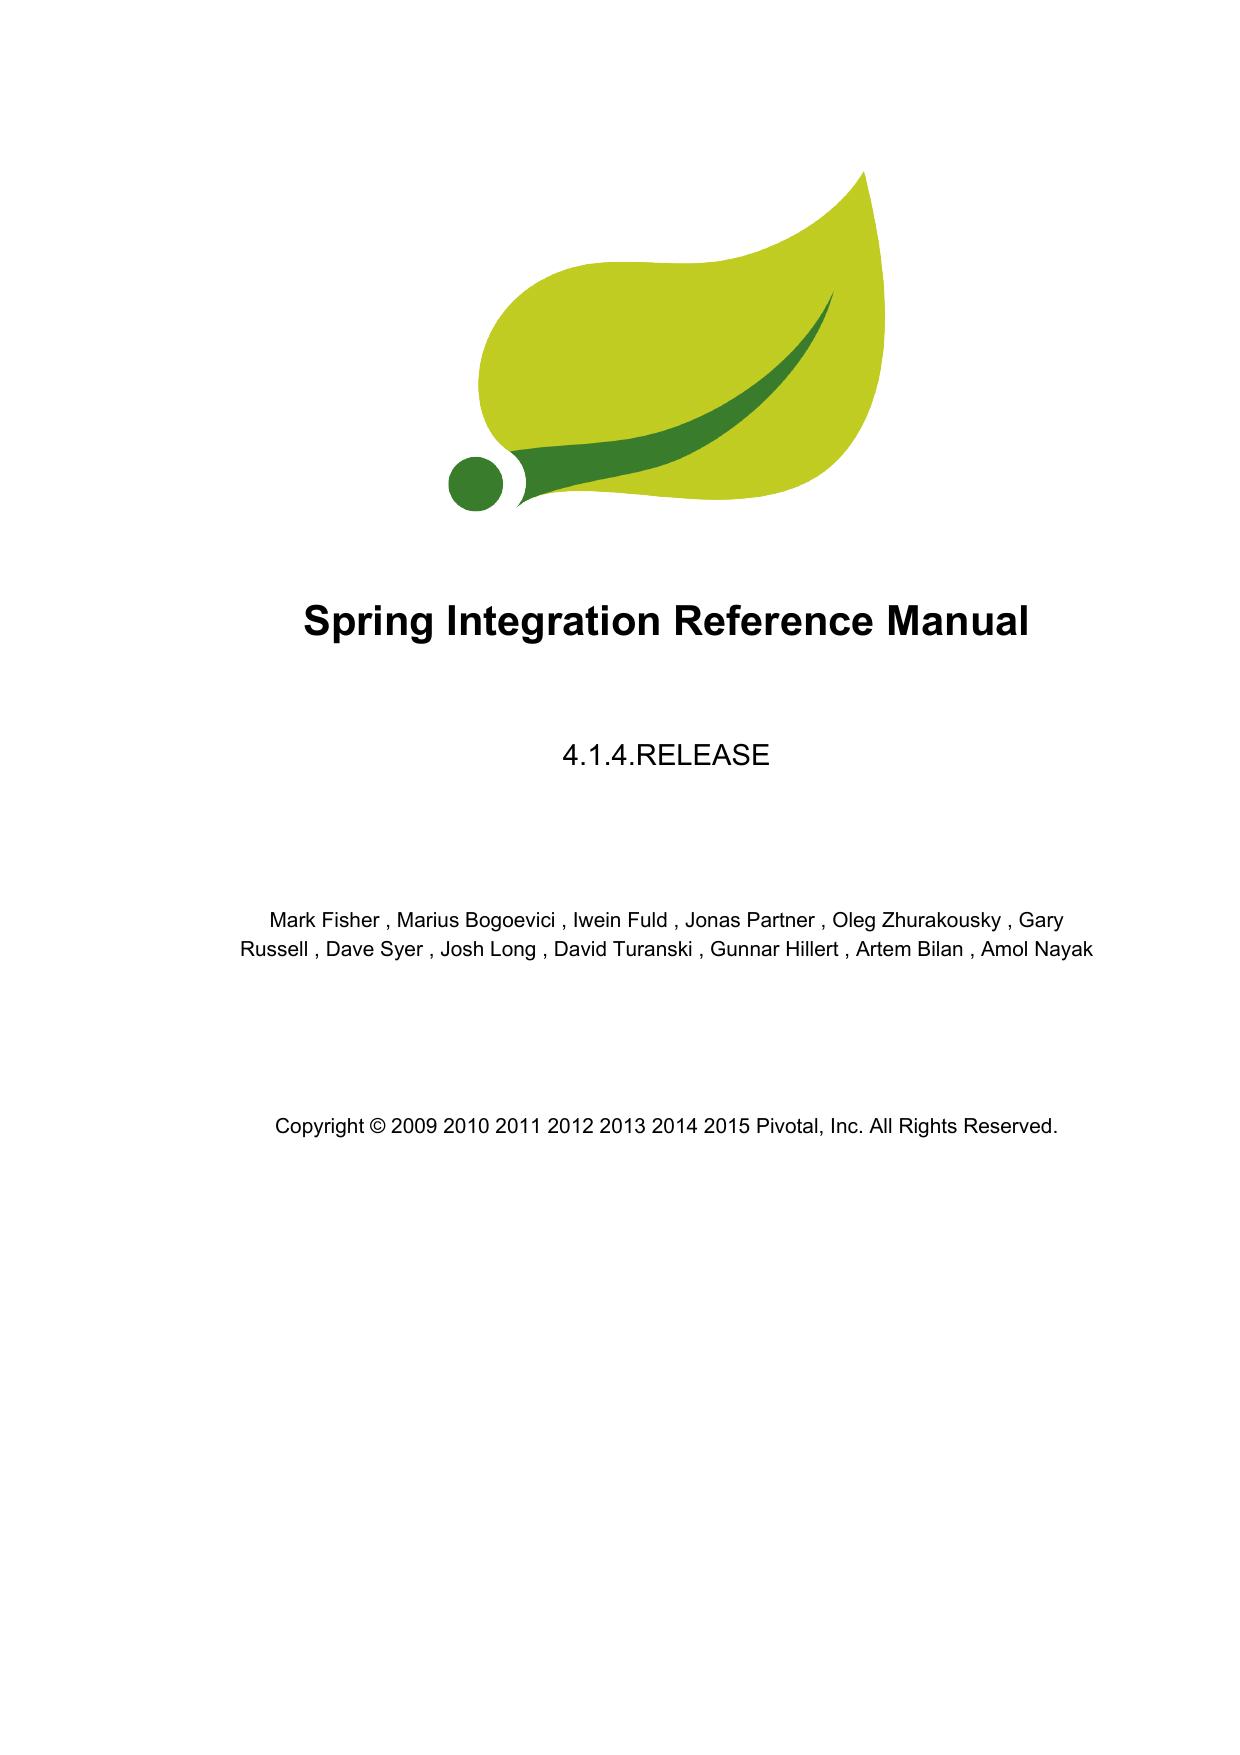 Spring Integration Reference Manual | manualzz com